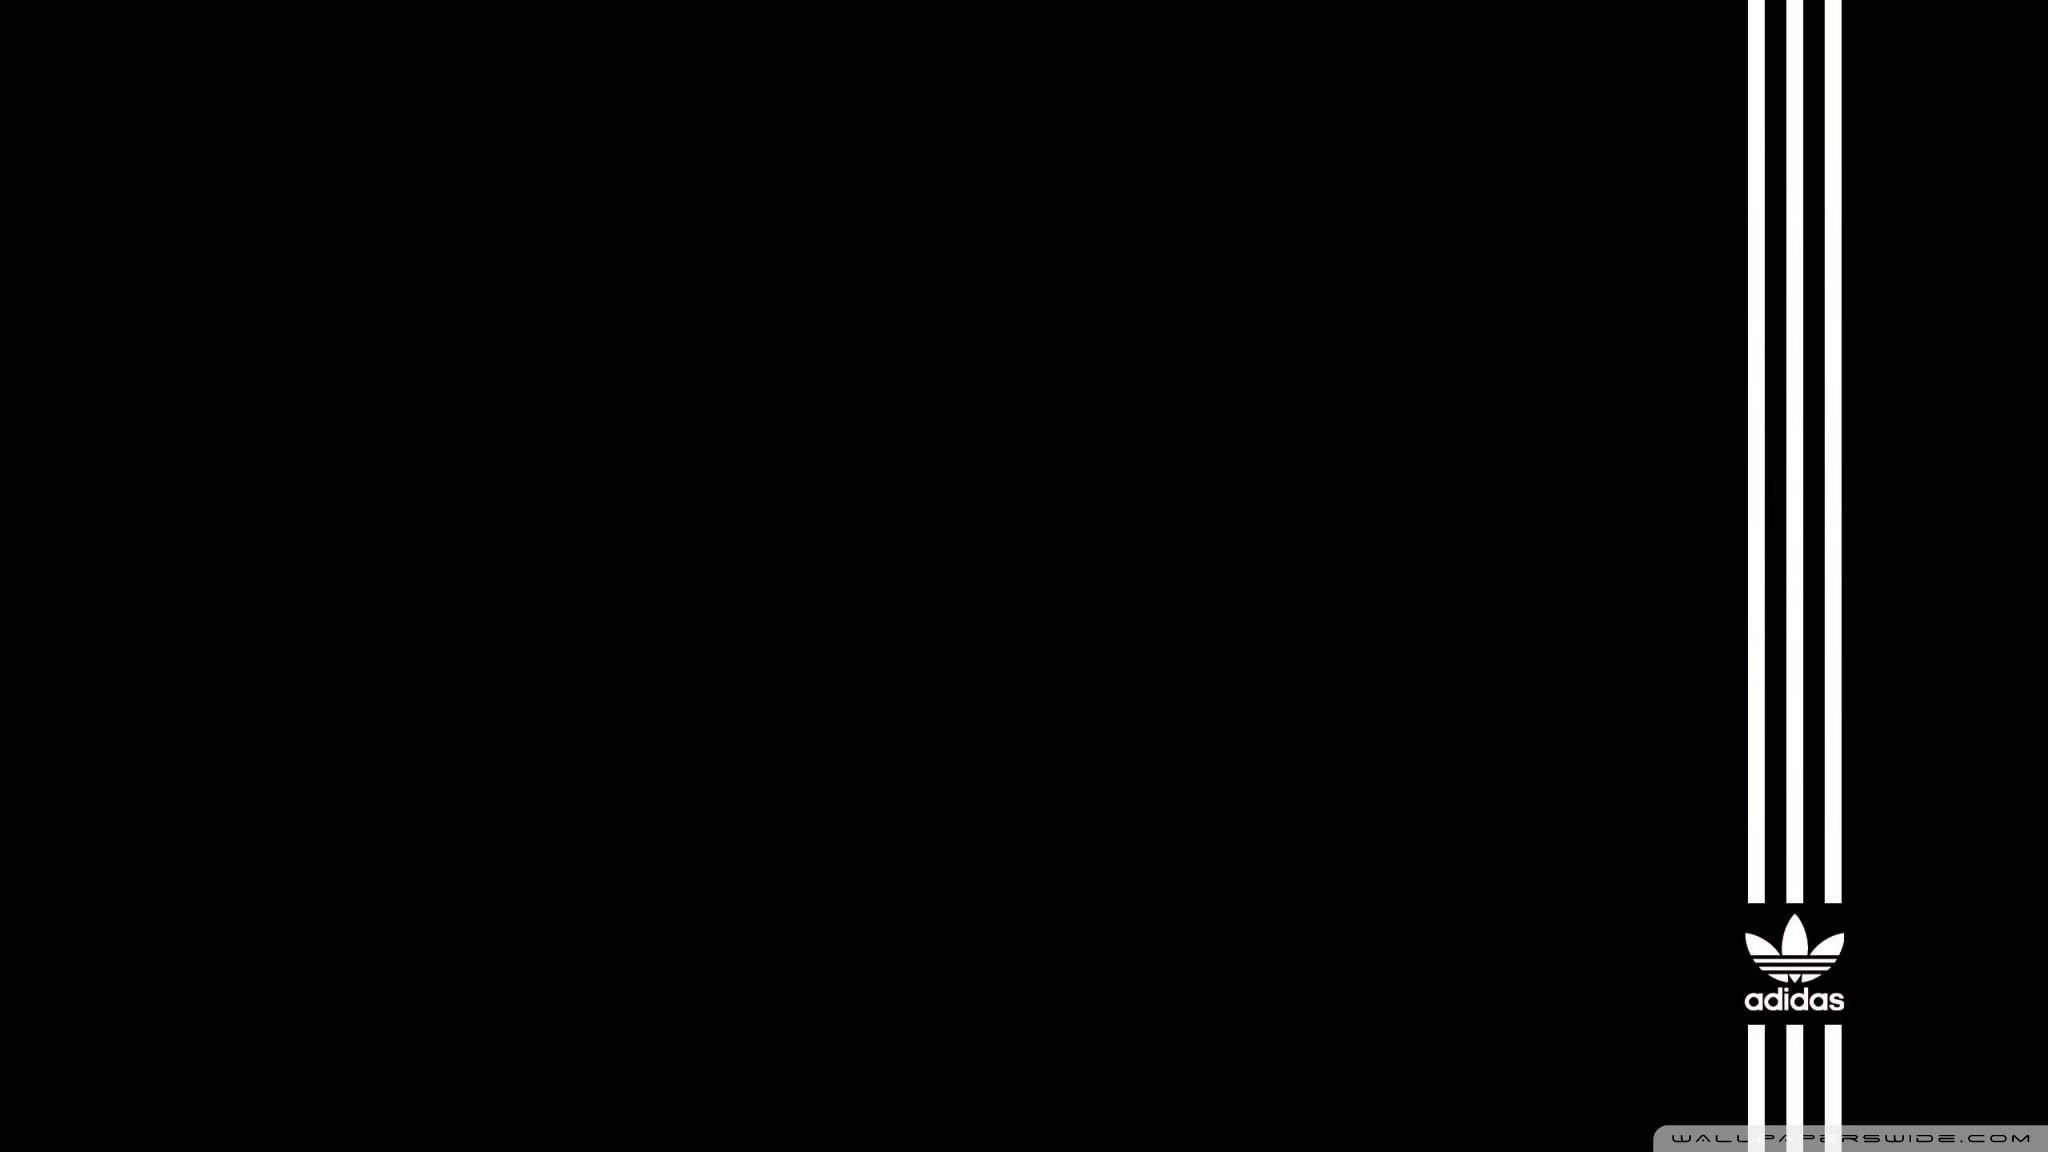 HD 16:9